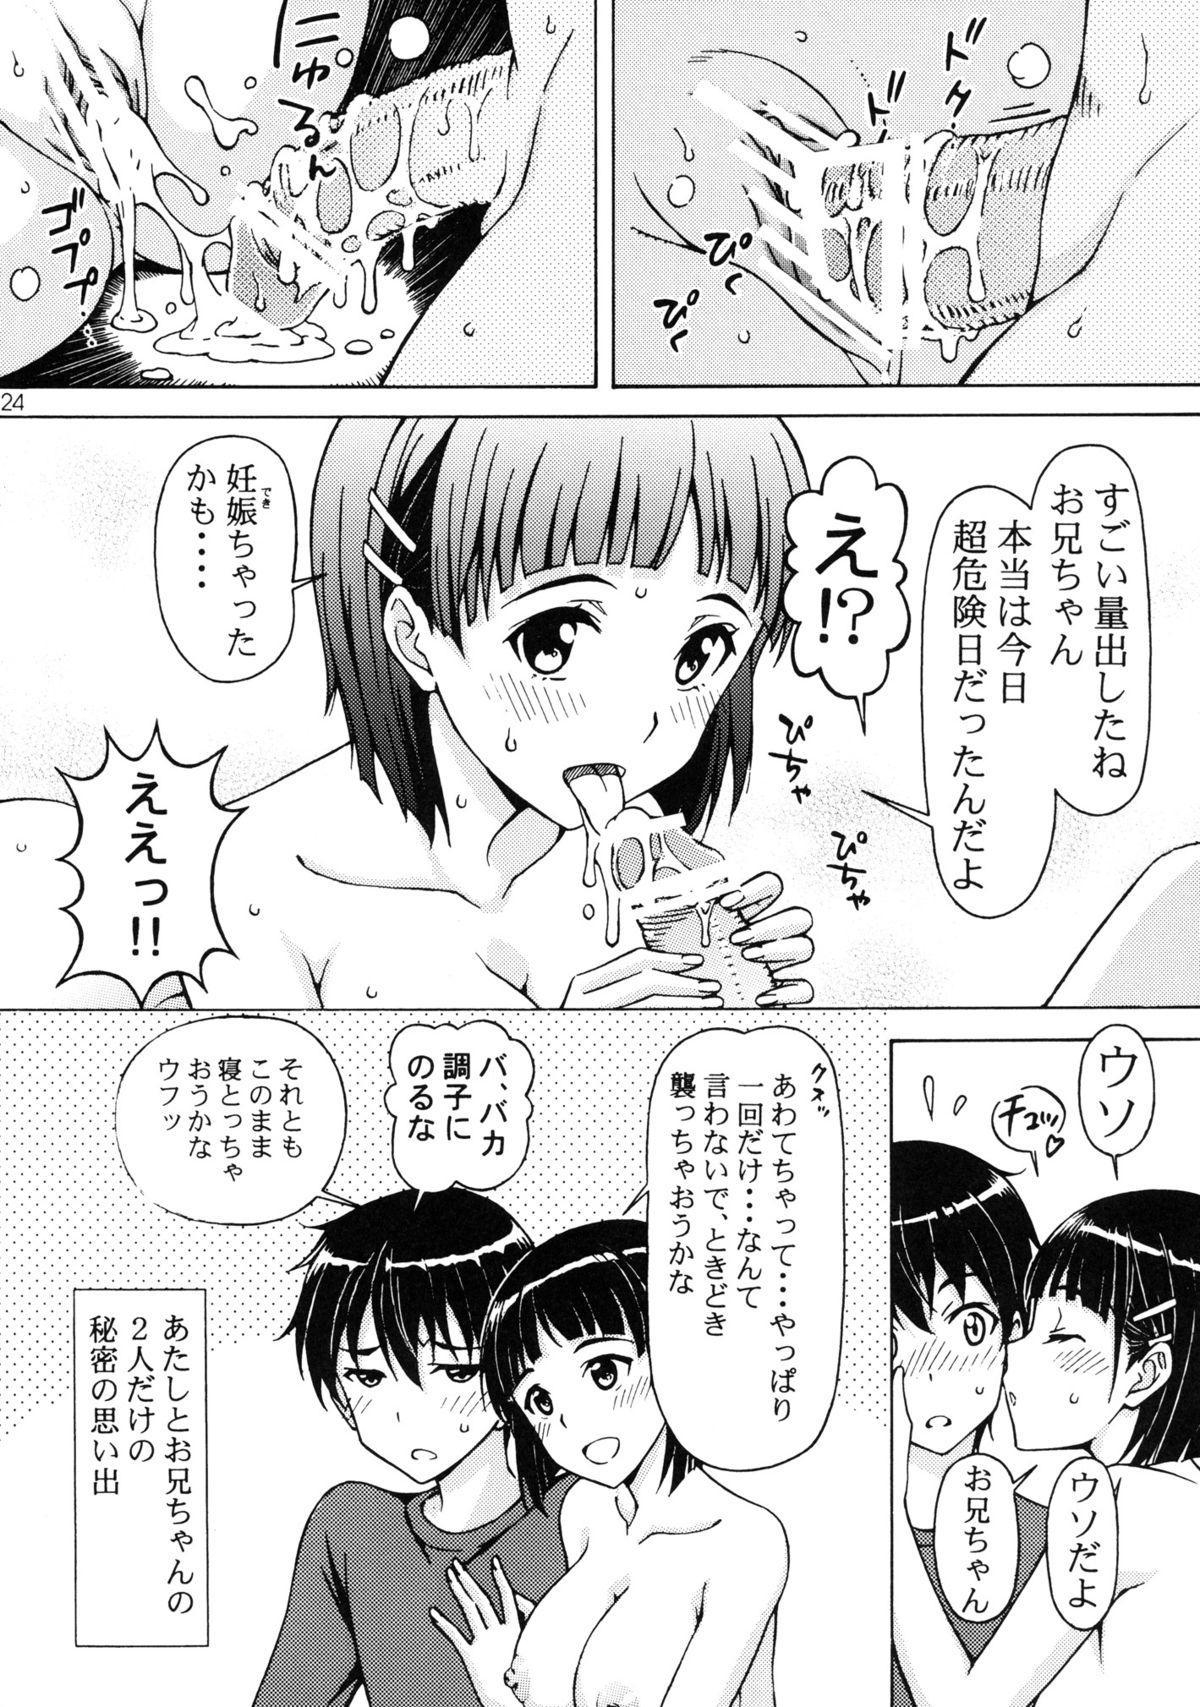 Kinshinsoukan - Nakadashi Suguha 23